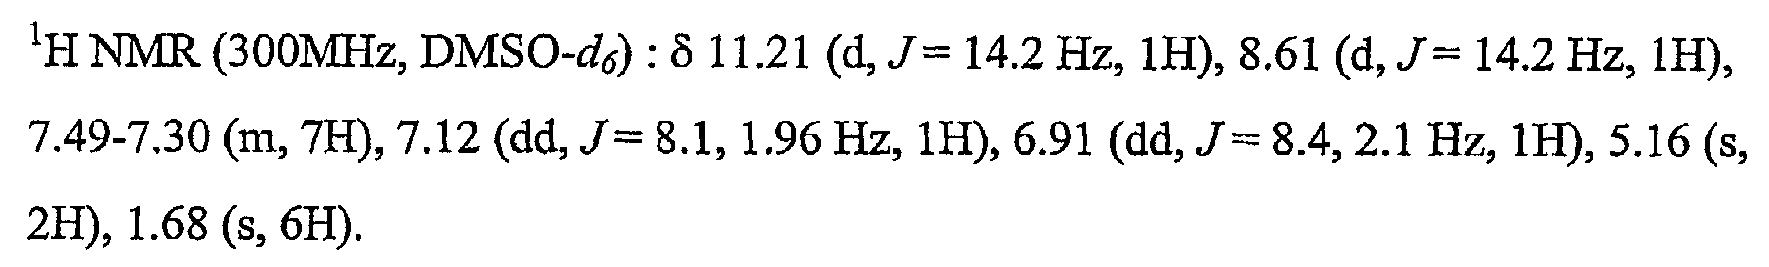 Figure 112006013759285-pct00102